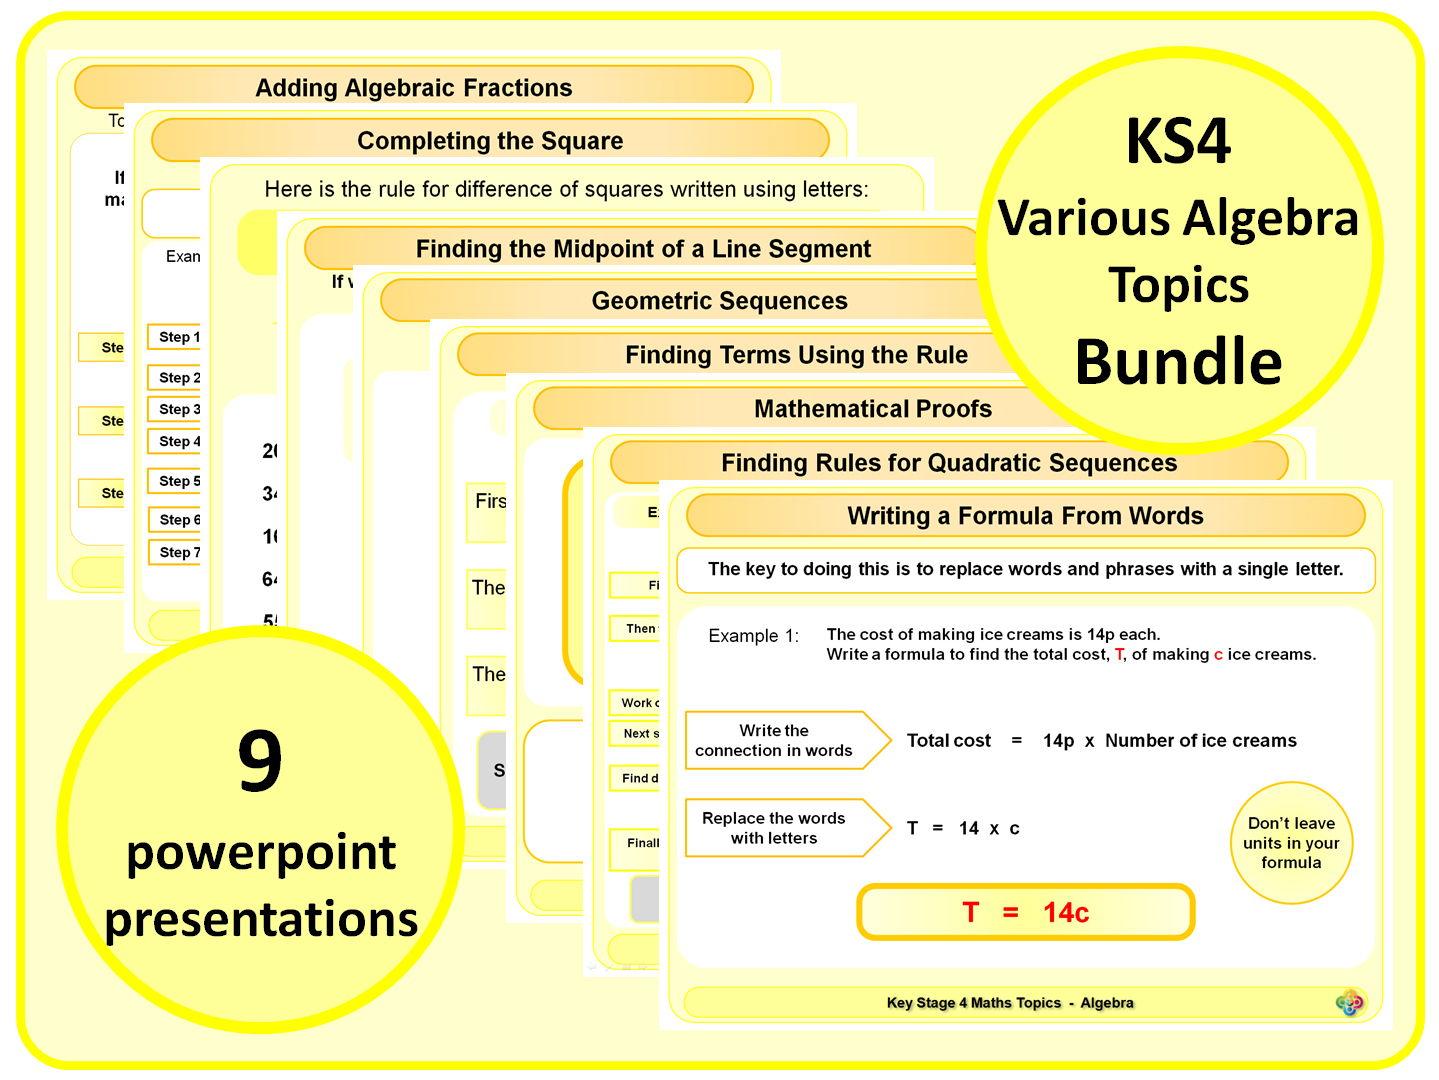 Ks4 Various Algebra Topics By Magictrickster